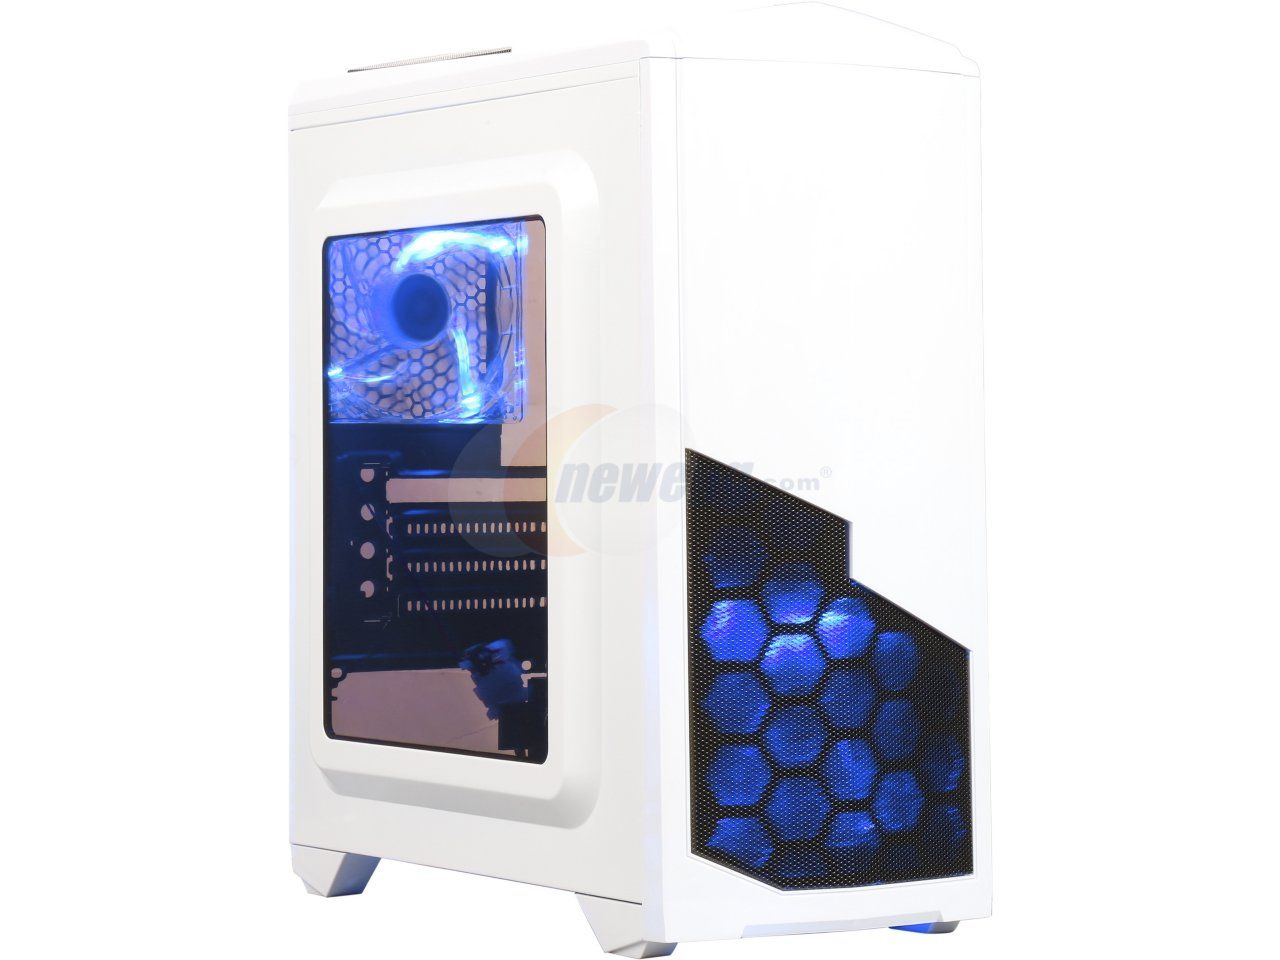 2f4bbb5710b1e89048bd9505562447f9 diypc diy n8 w white usb 3 0 micro atx mini tower gaming computer  at n-0.co